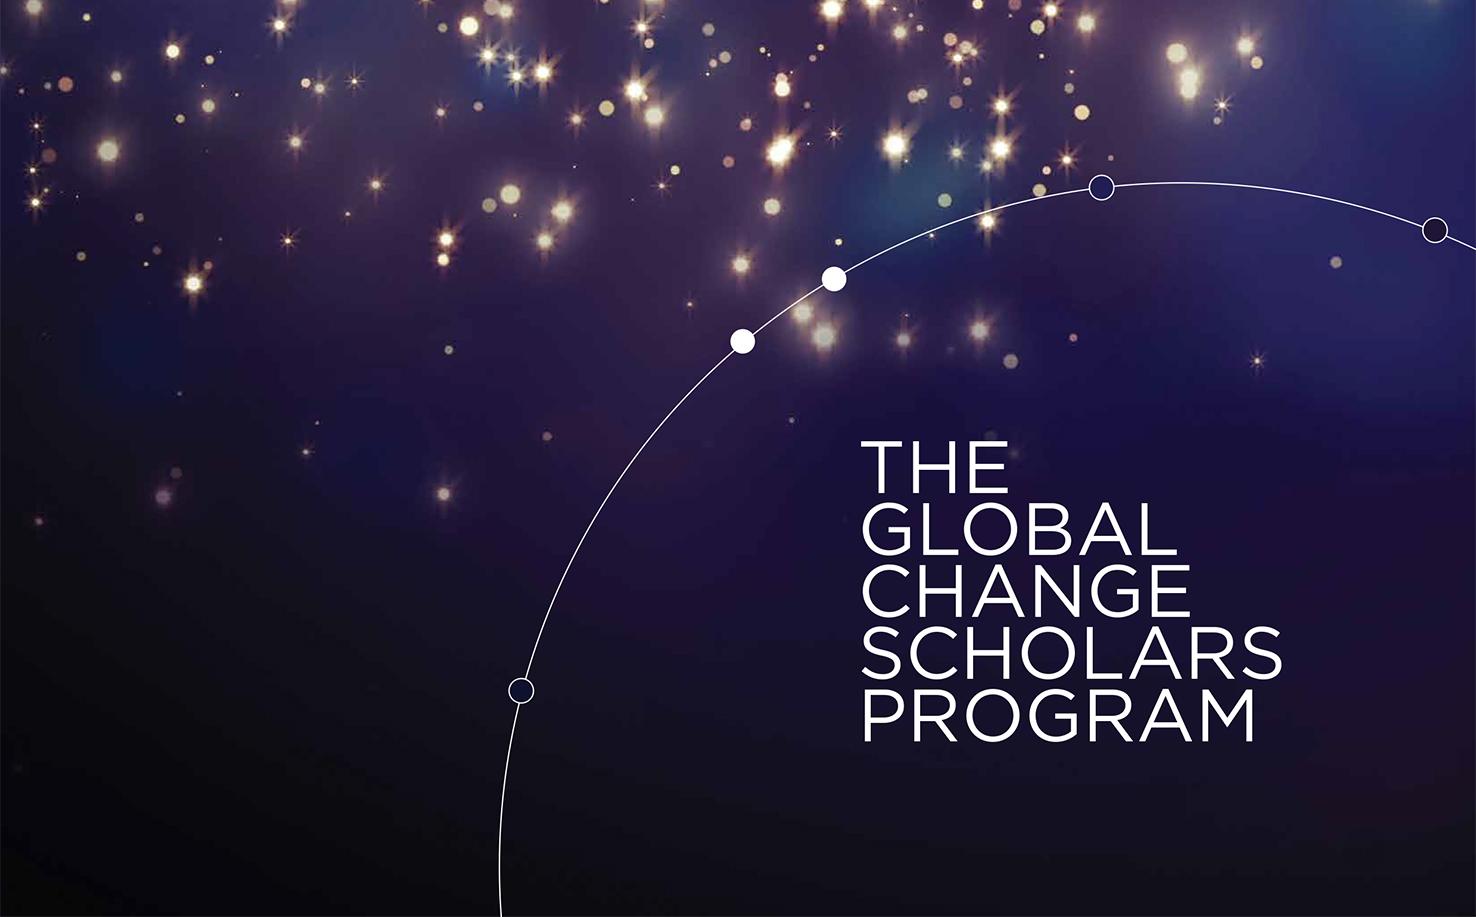 Global Change Scholars Program